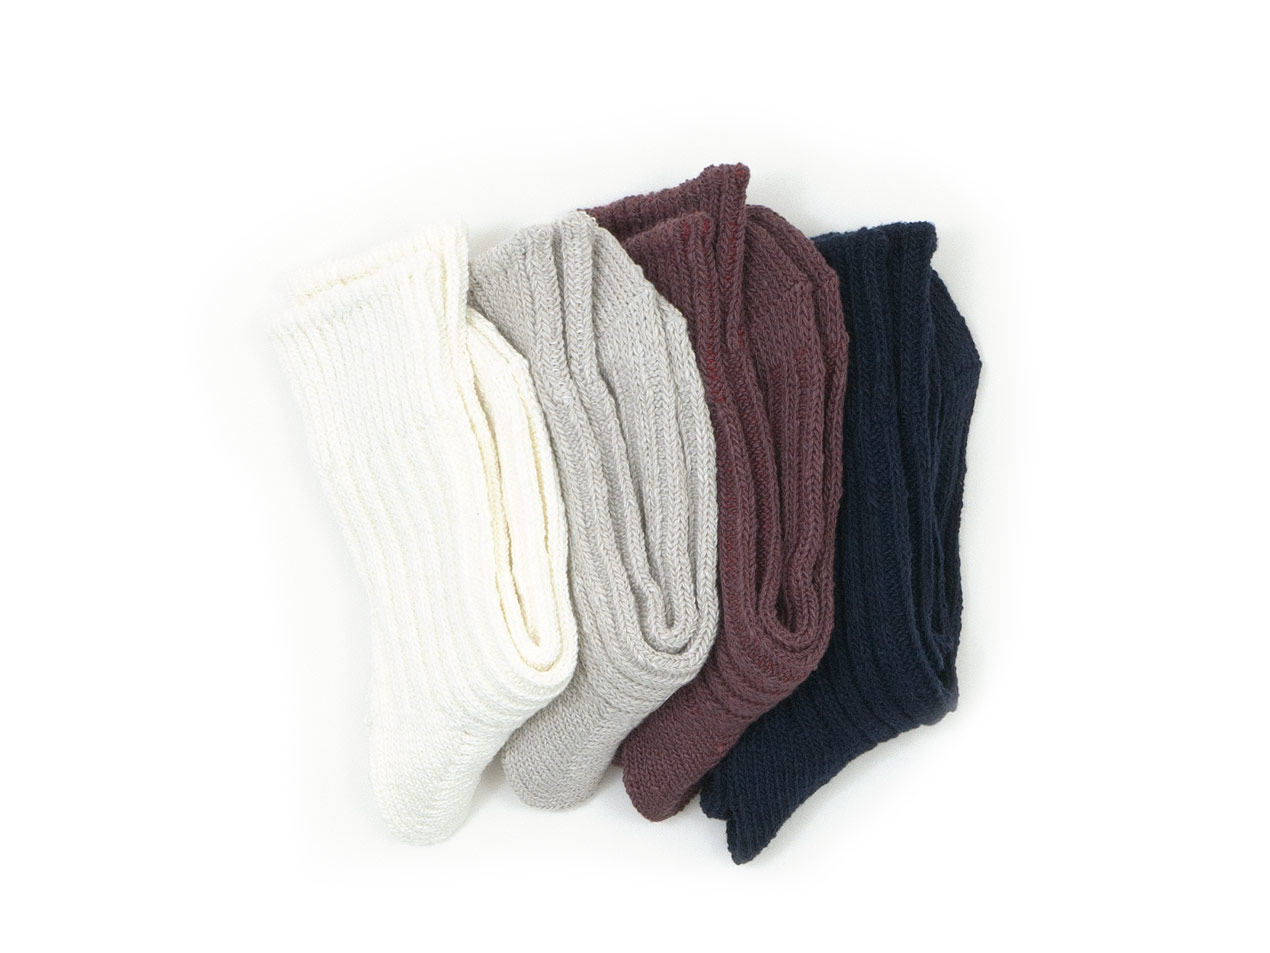 TOUJOURS Bulky Yarn Cotton Rib Socks